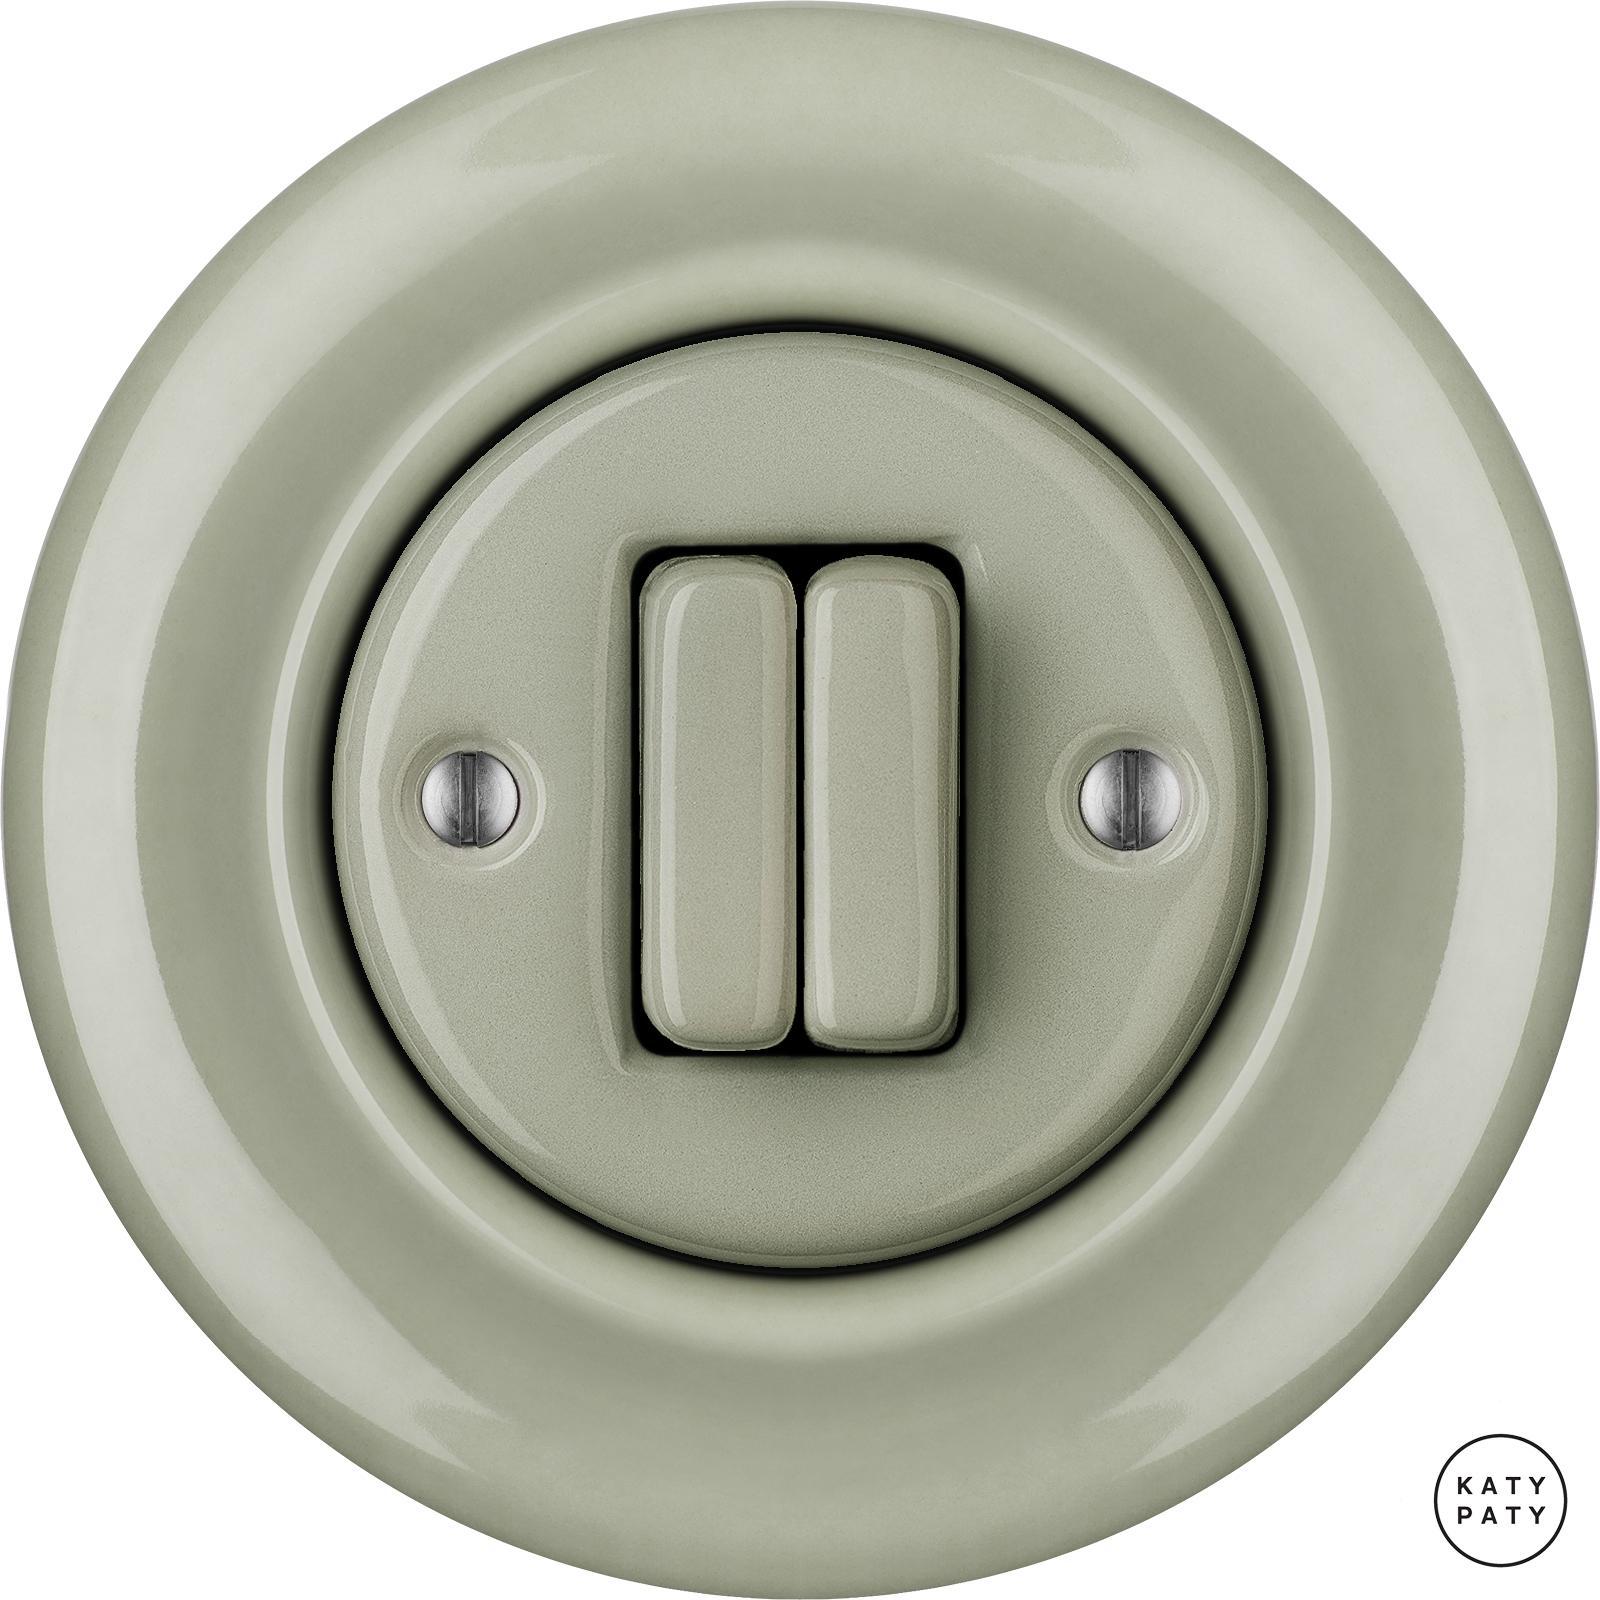 roo interrupteur en porcelaine clapet double chlora. Black Bedroom Furniture Sets. Home Design Ideas